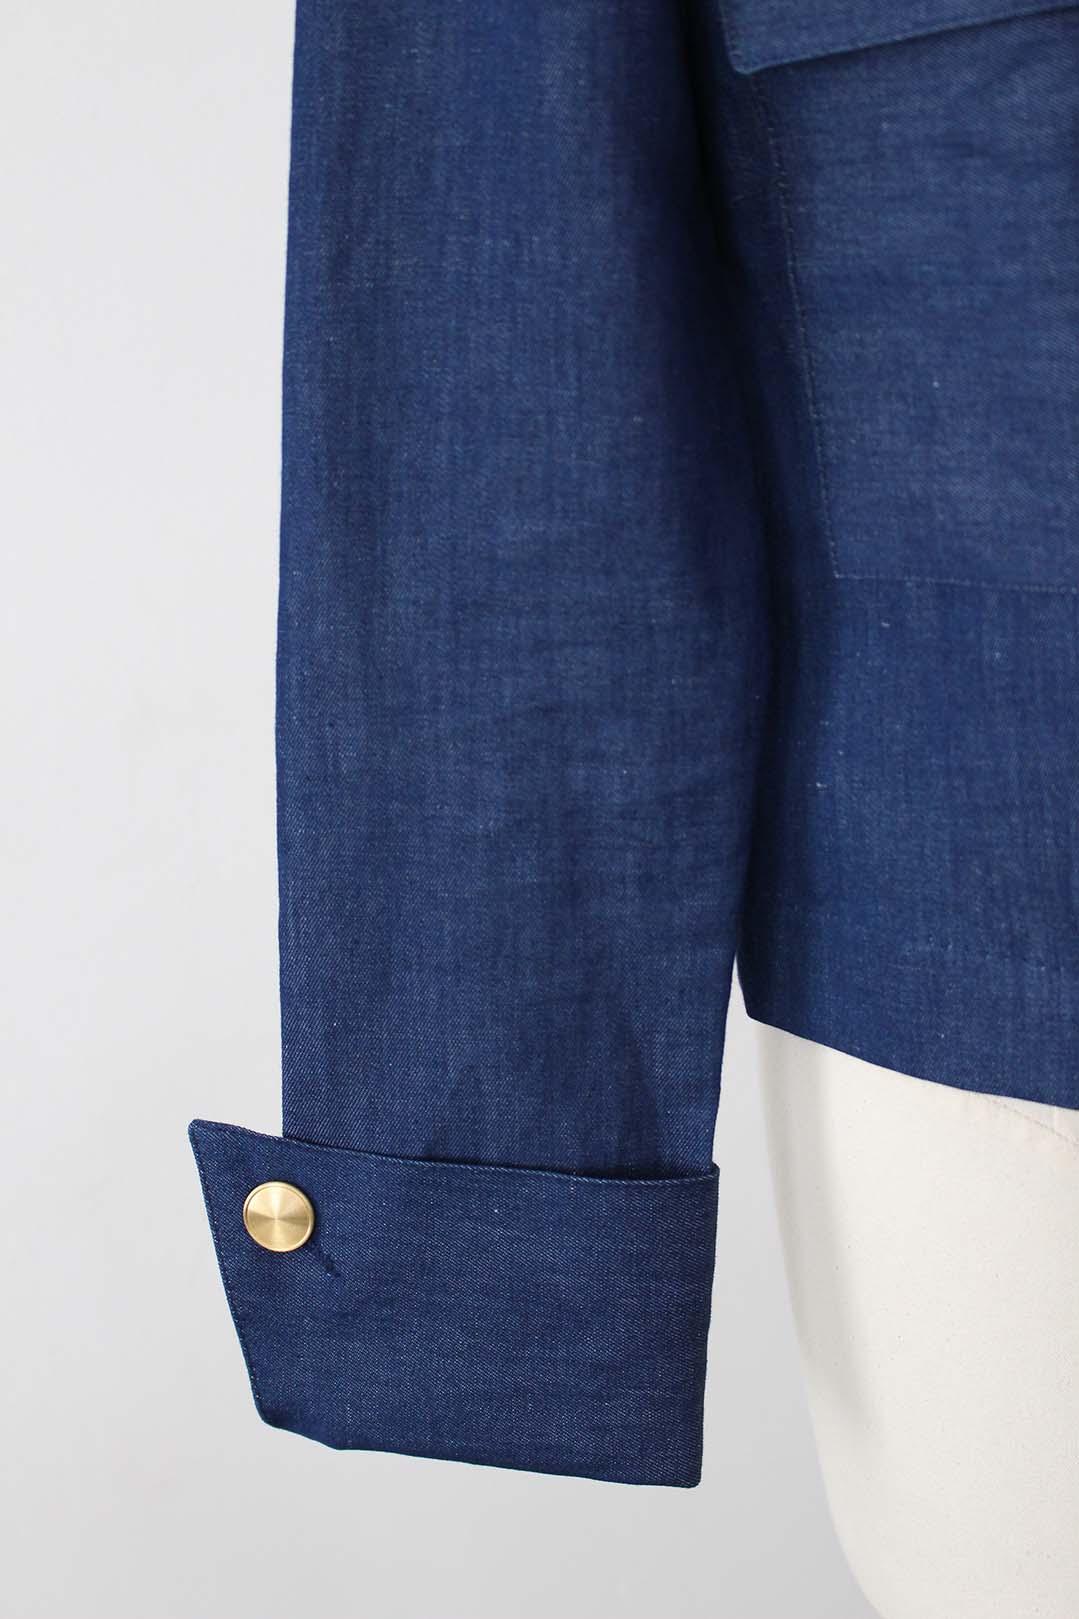 VESTE COURTE bleu jean